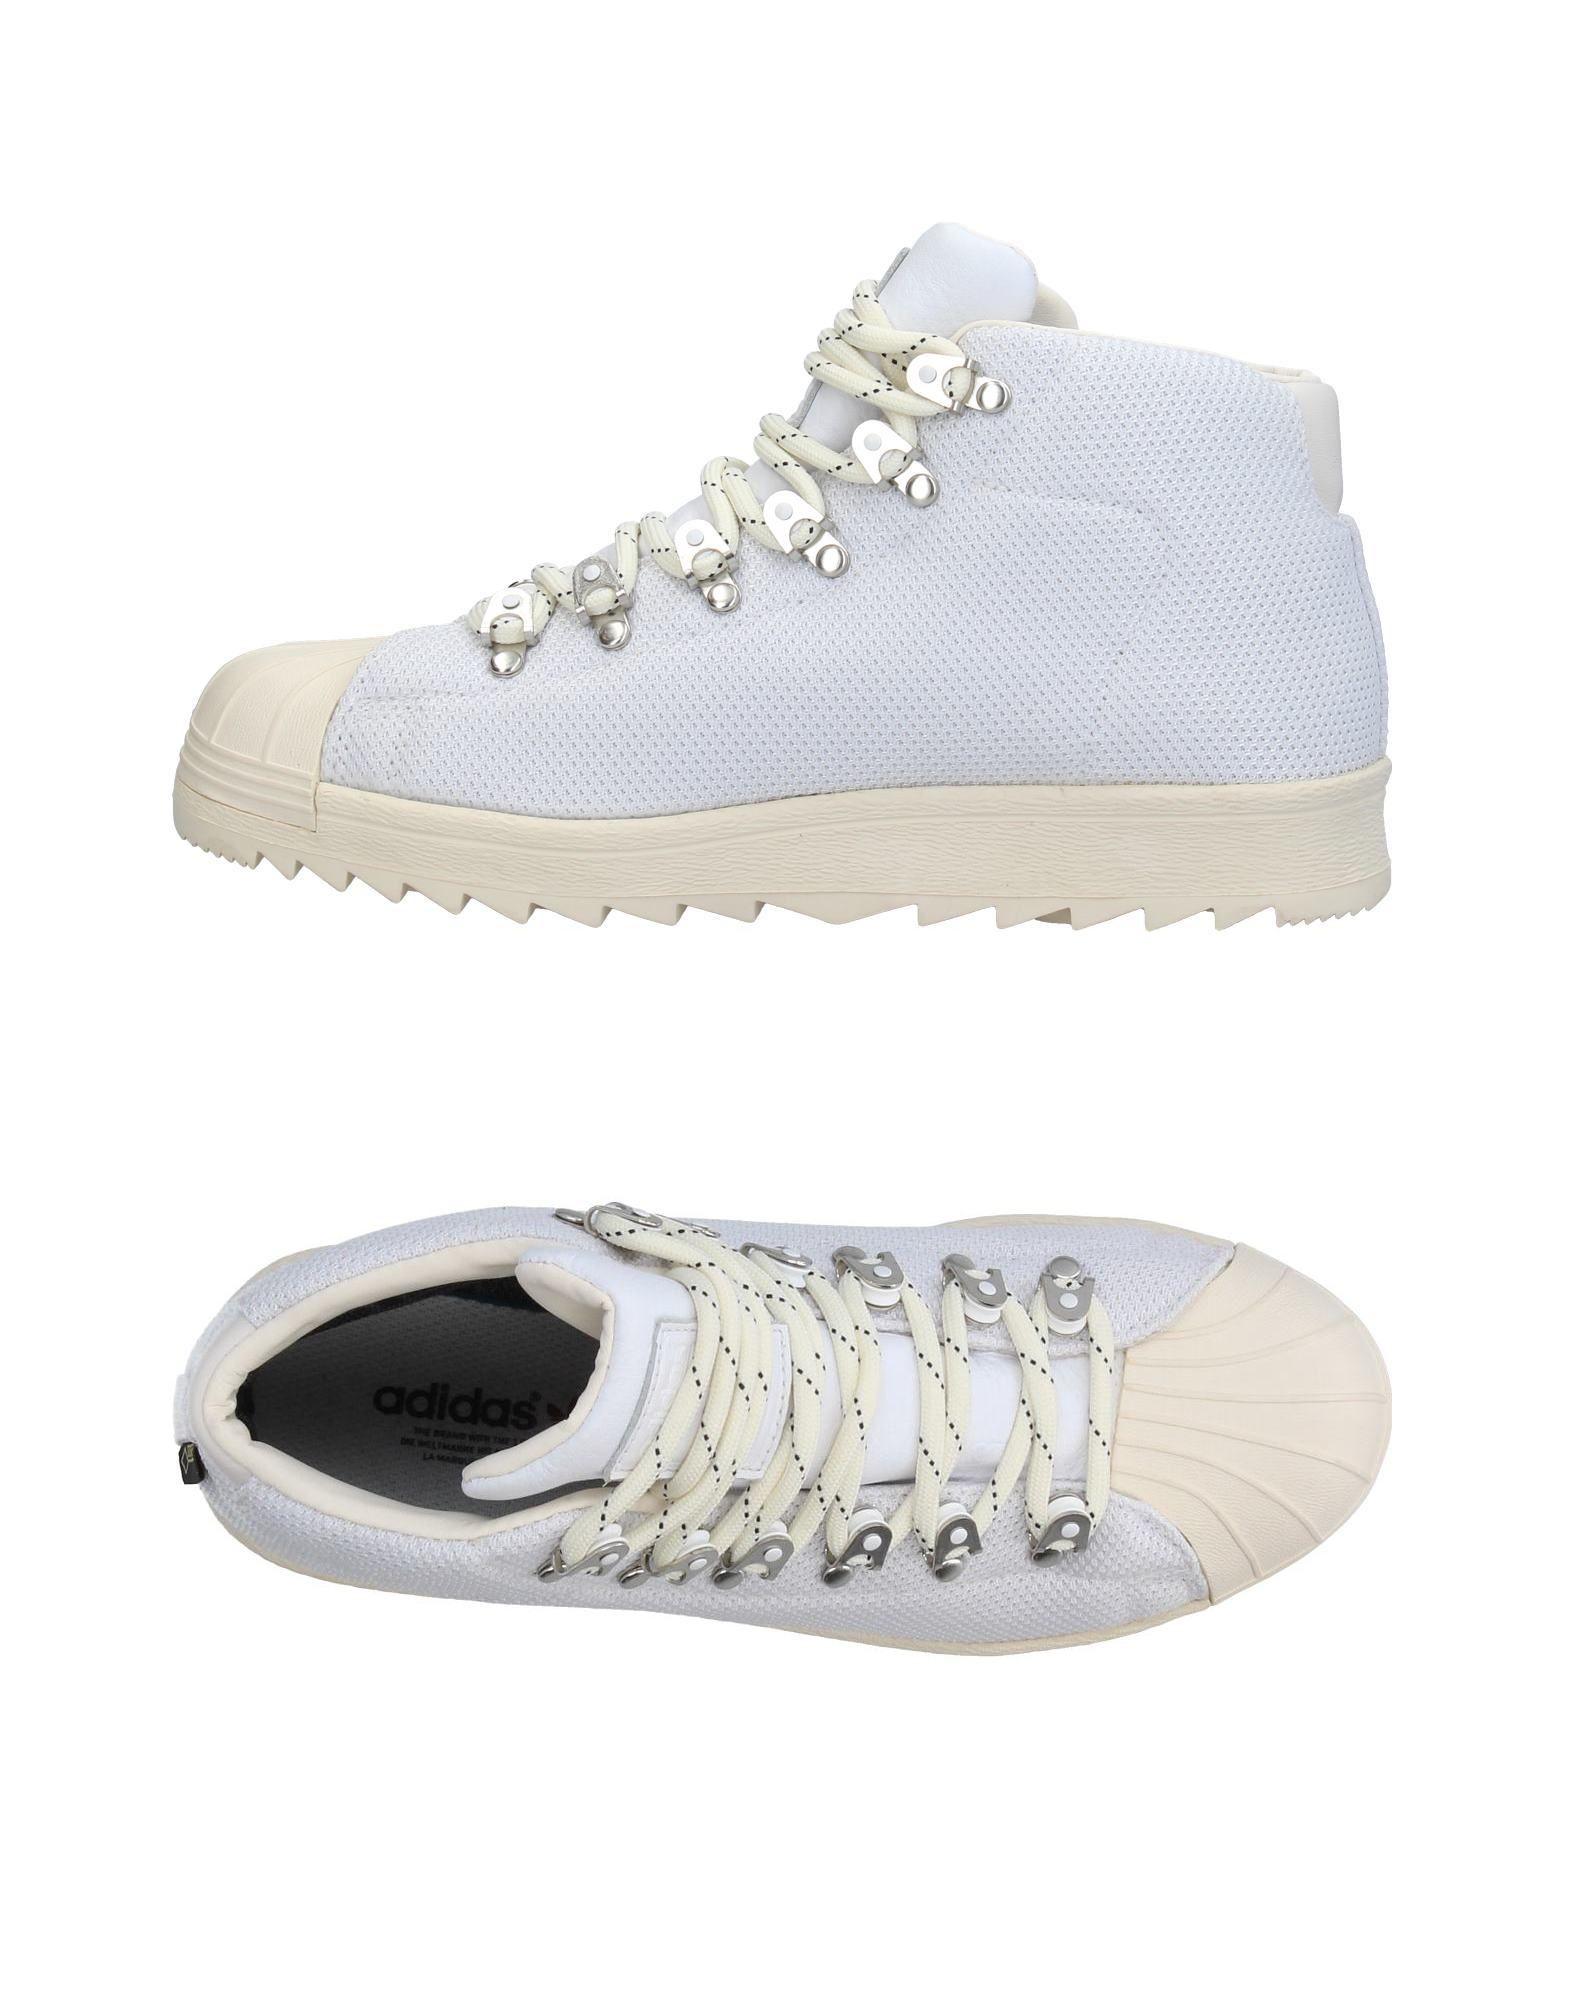 ADIDAS Высокие кеды и кроссовки кеды кроссовки высокие dc council mid tx stone camo